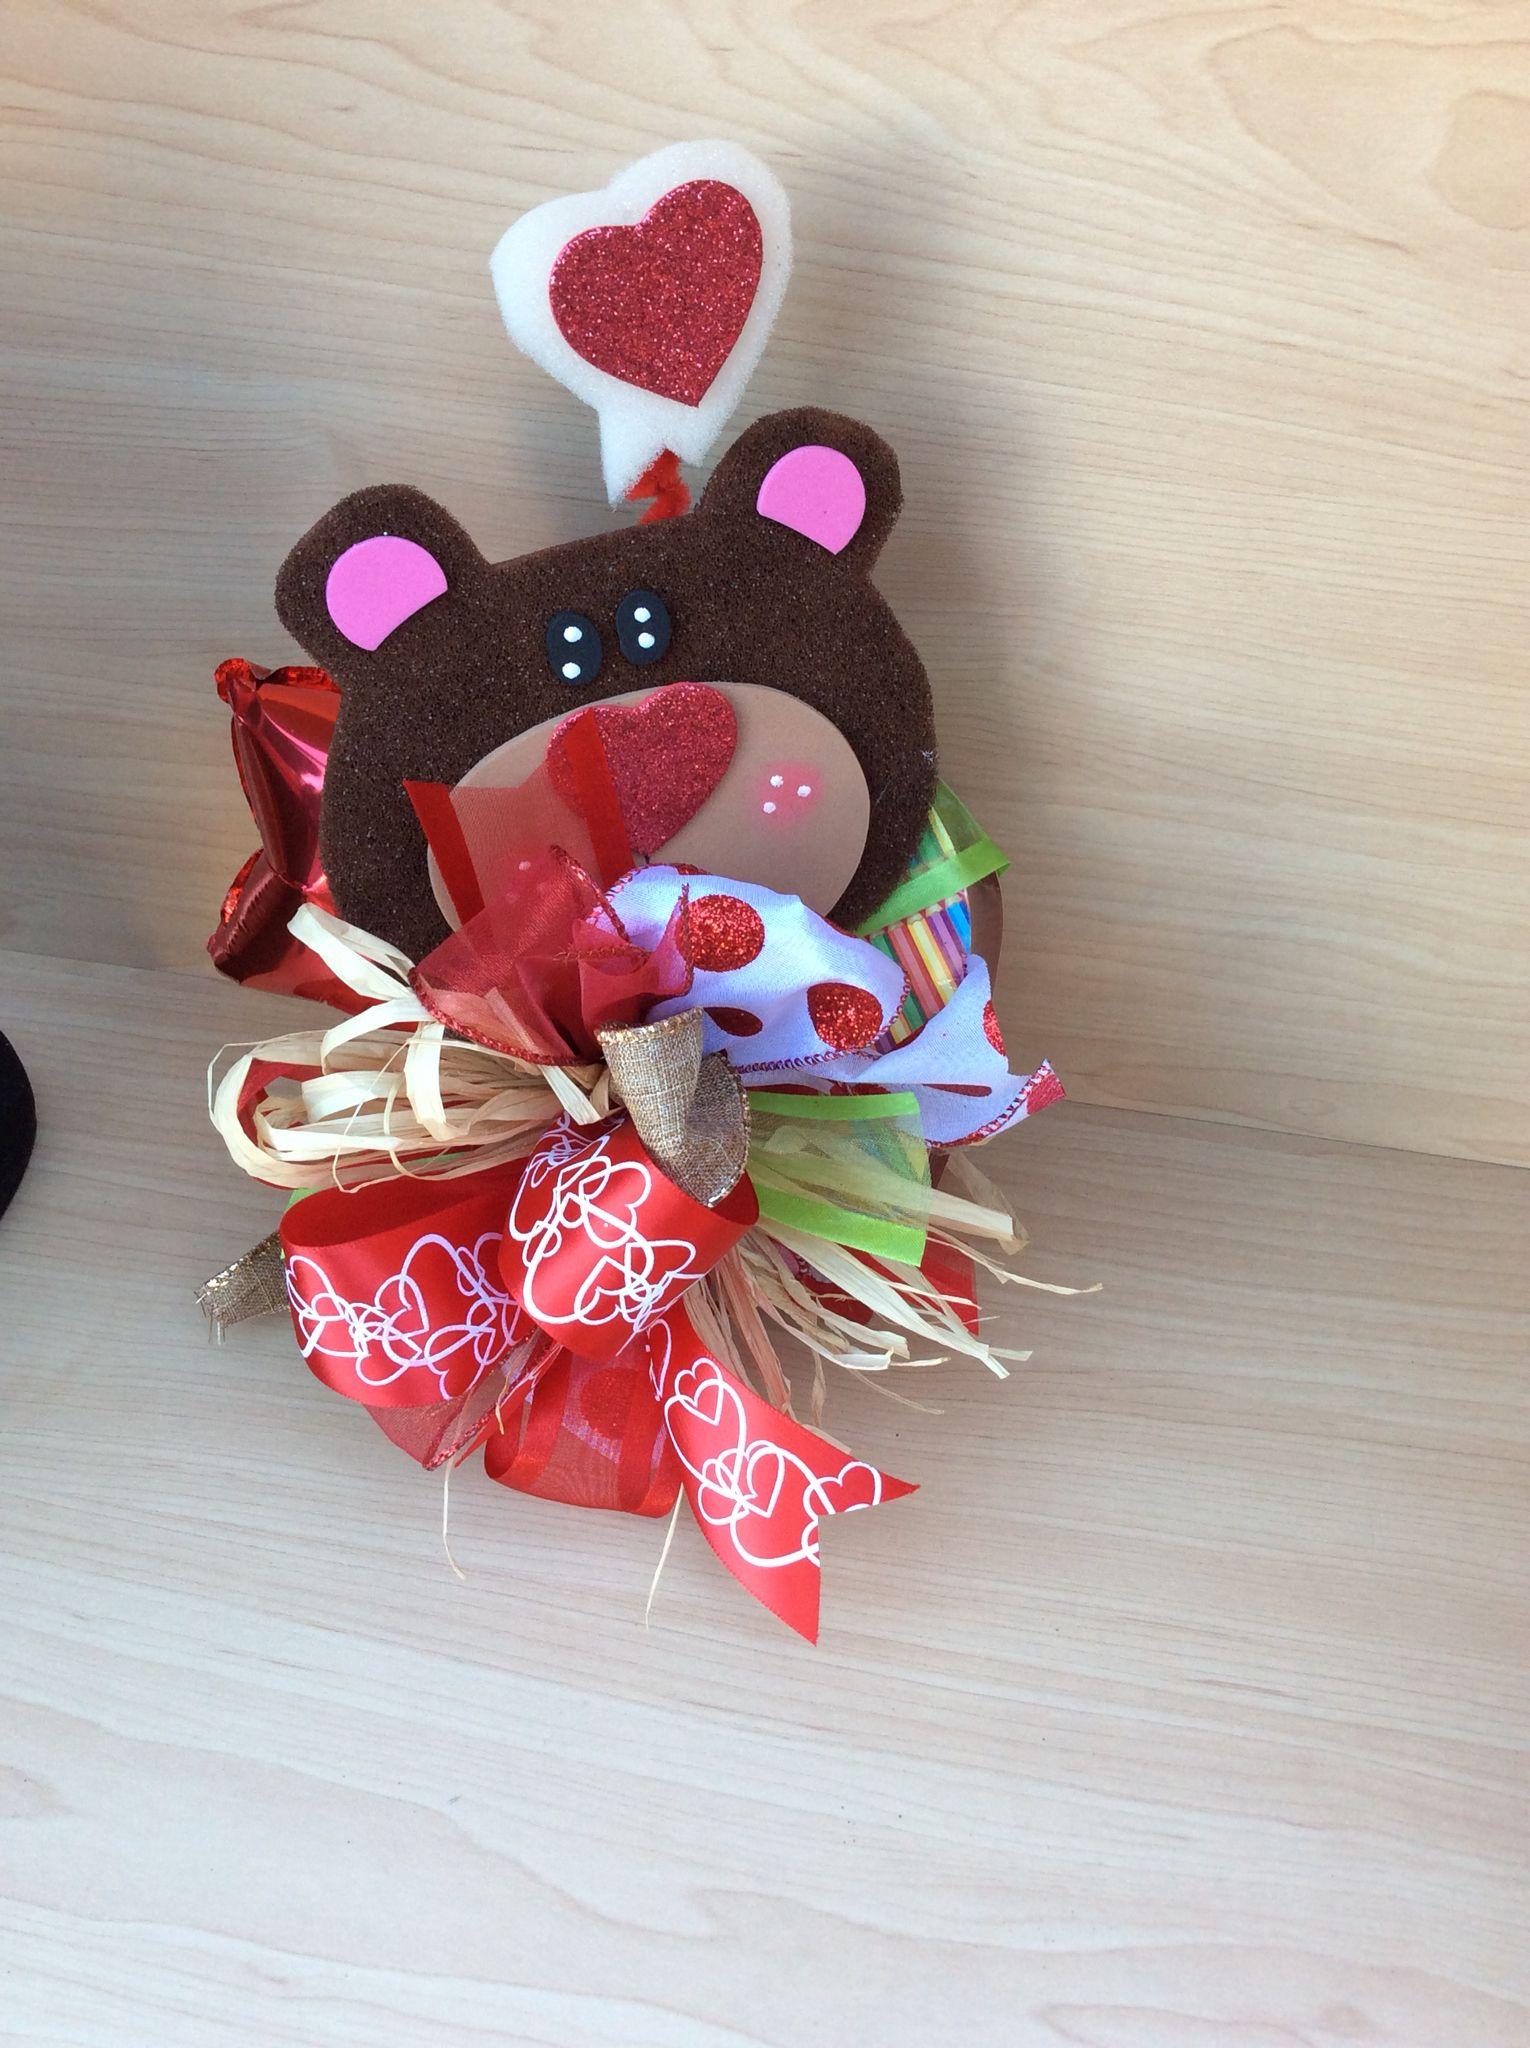 Detalle amor detalles para el 14 de febrero pinterest ideas san valentin simple gifts - Ideas para sanvalentin ...